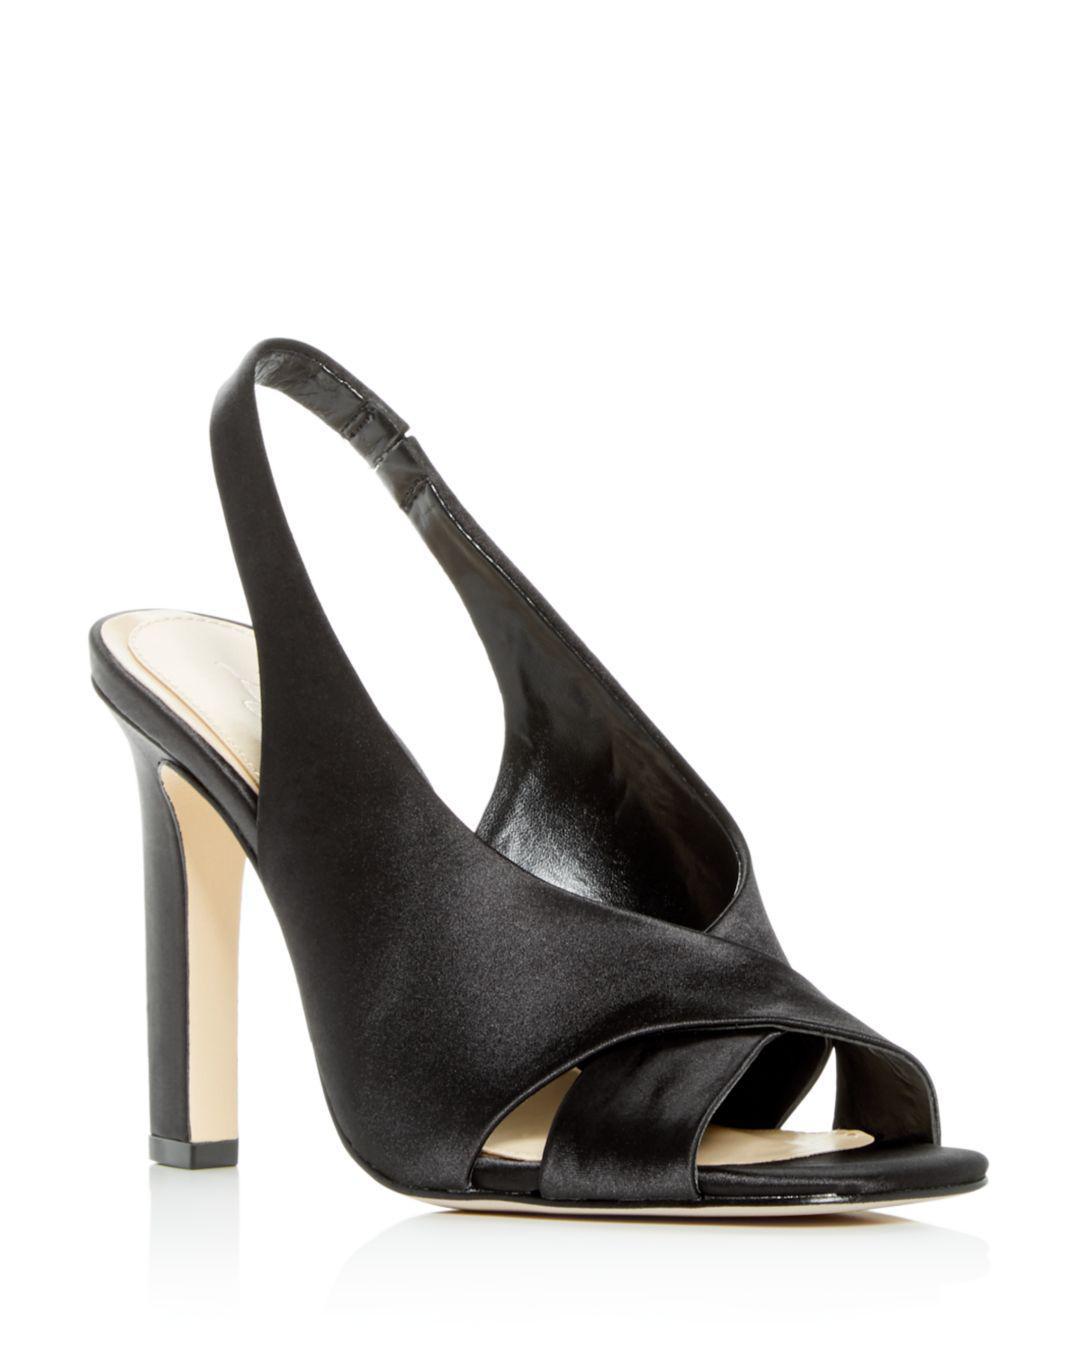 352c52aaf17 Imagine Vince Camuto. Black Women s Wrennie Slingback High-heel Sandals